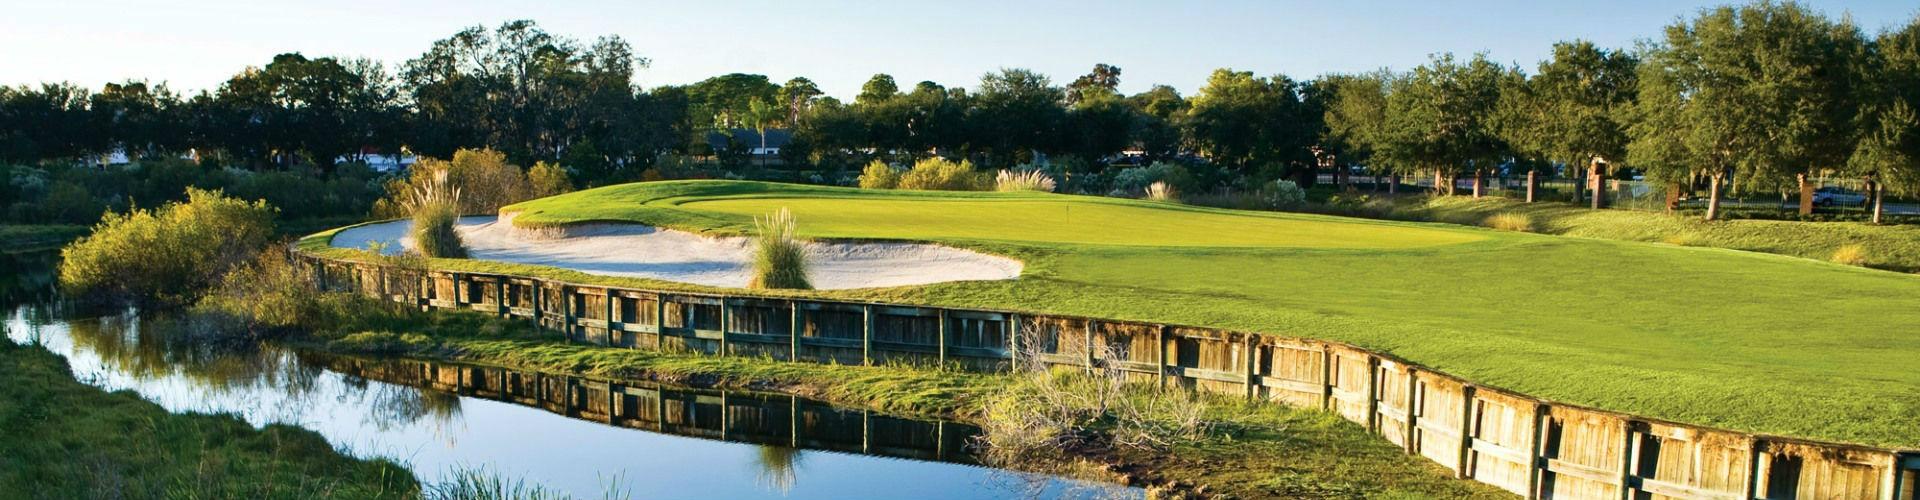 Golfresor Florida, USA - golfreseguiden.se